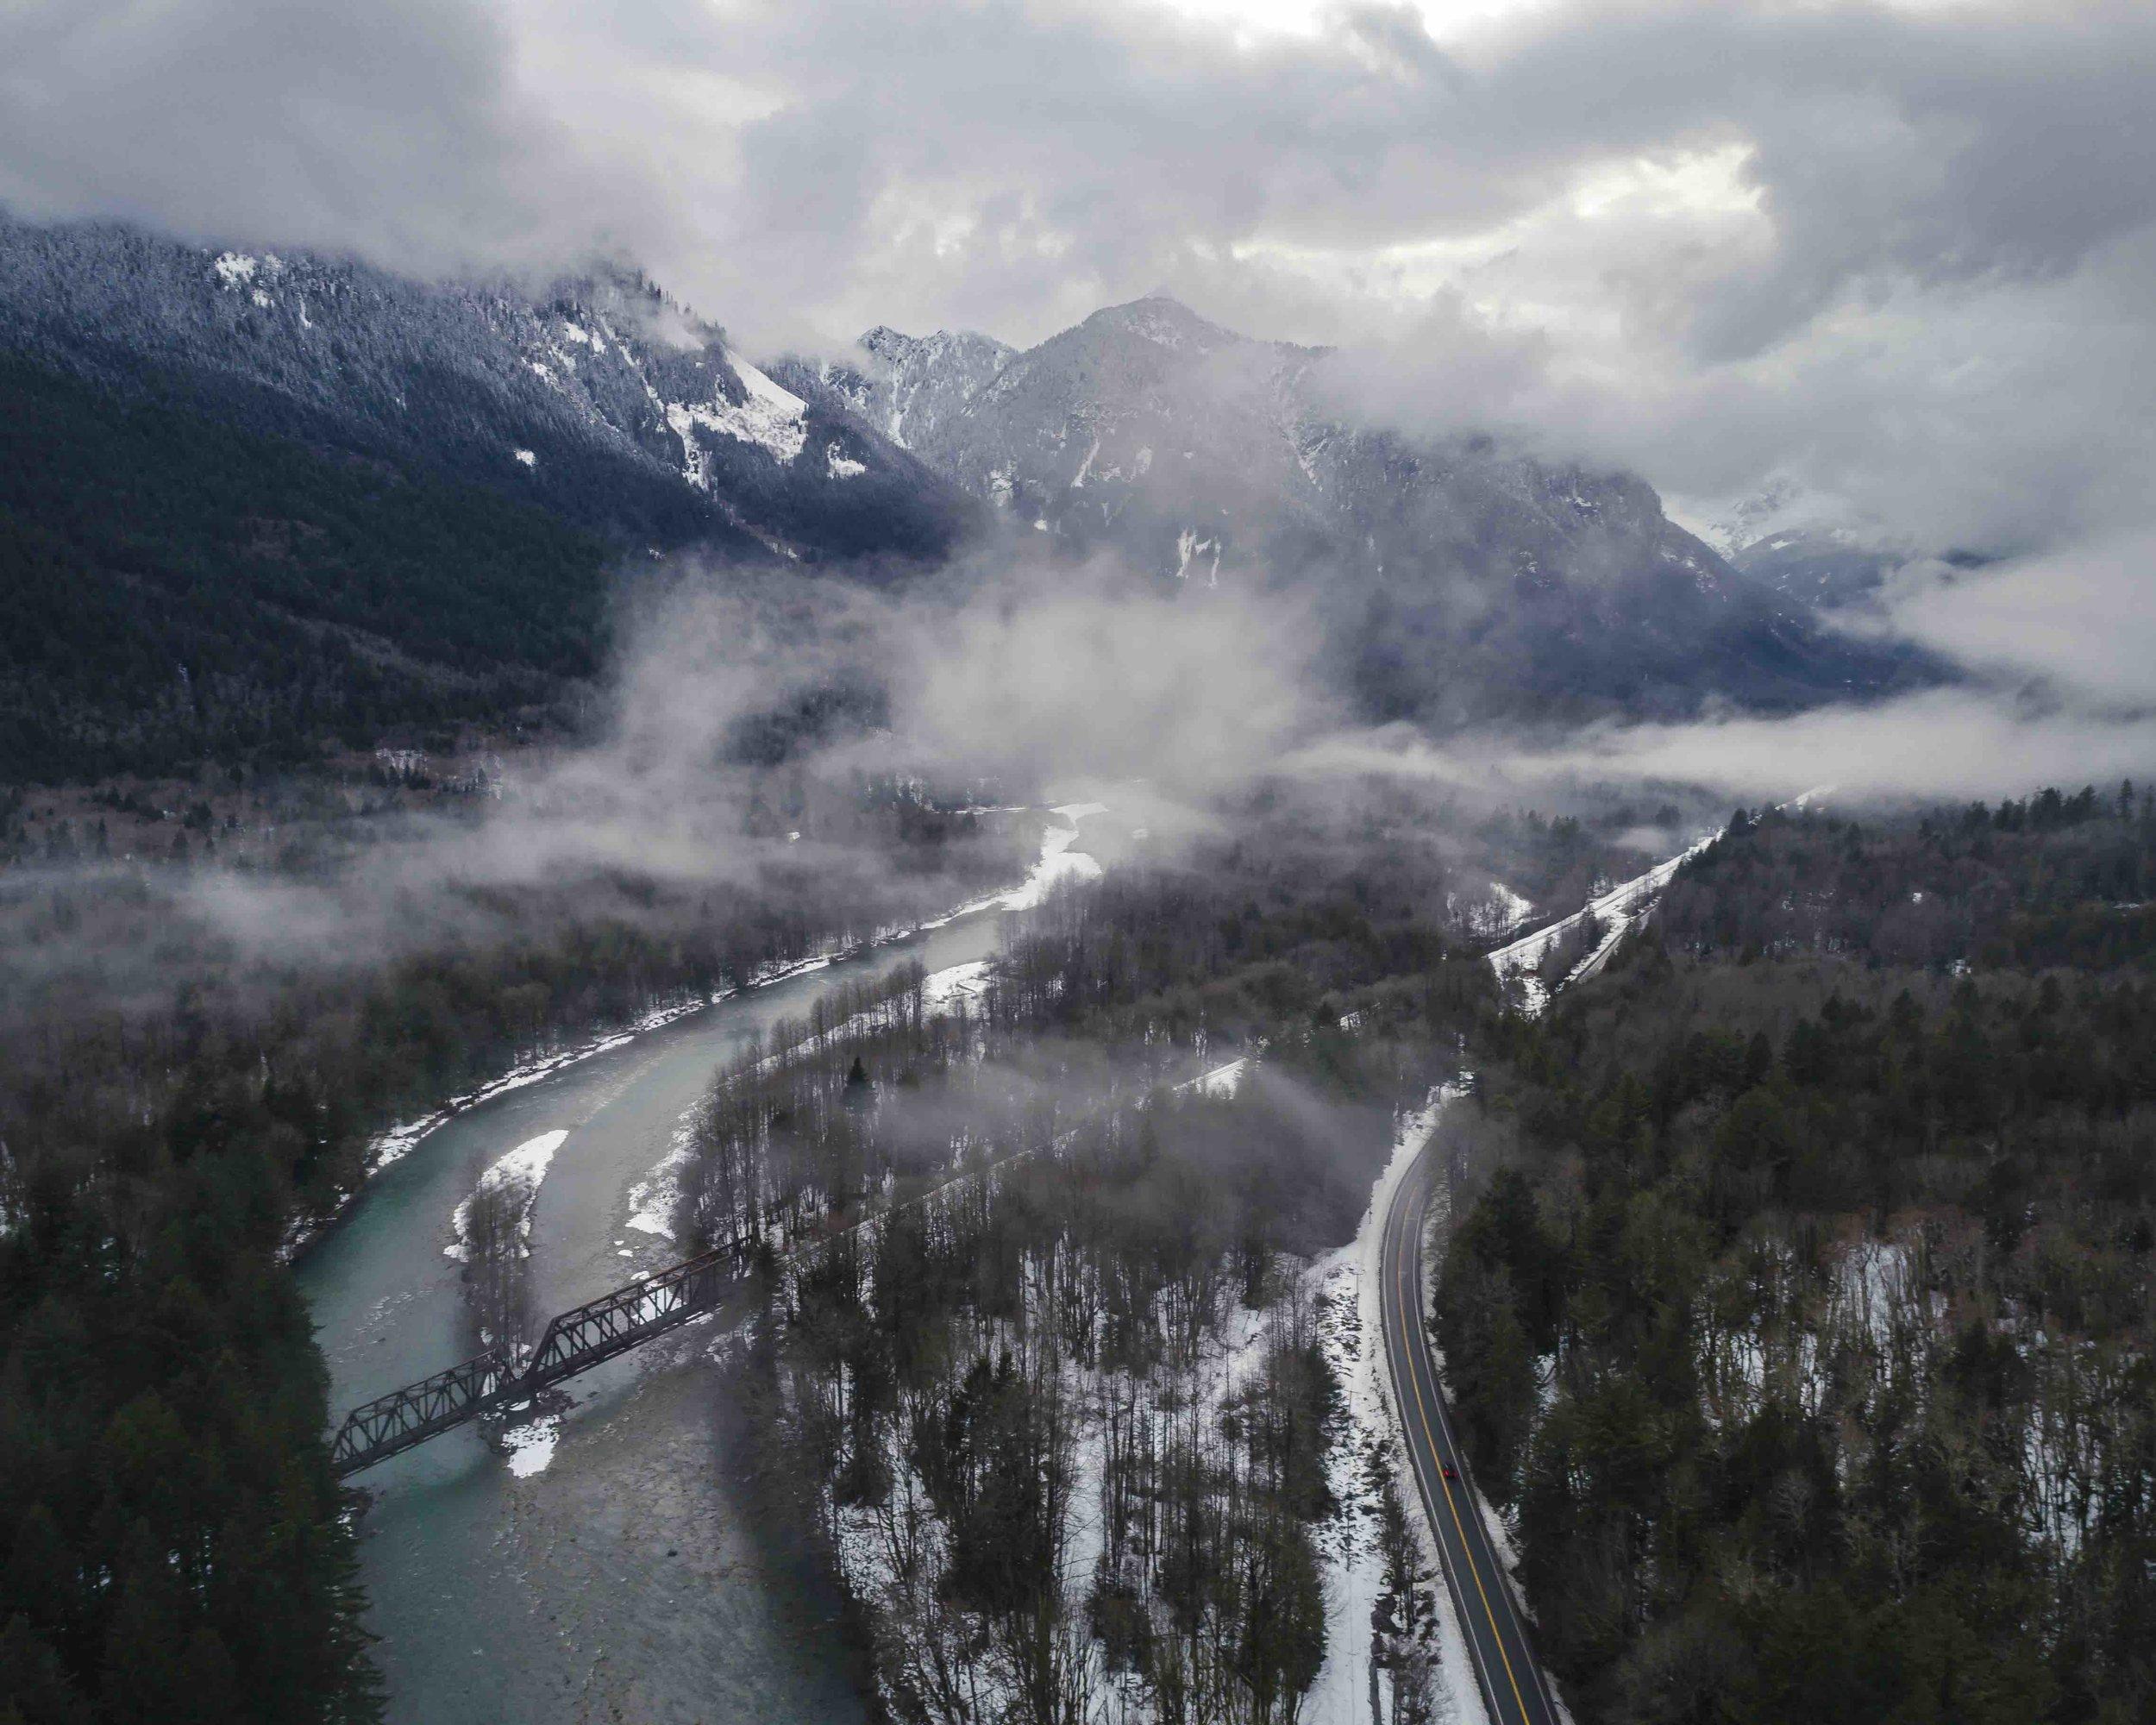 Light_Snow_Aerial_Over_Washington_Wilderenss_Backroad.jpeg